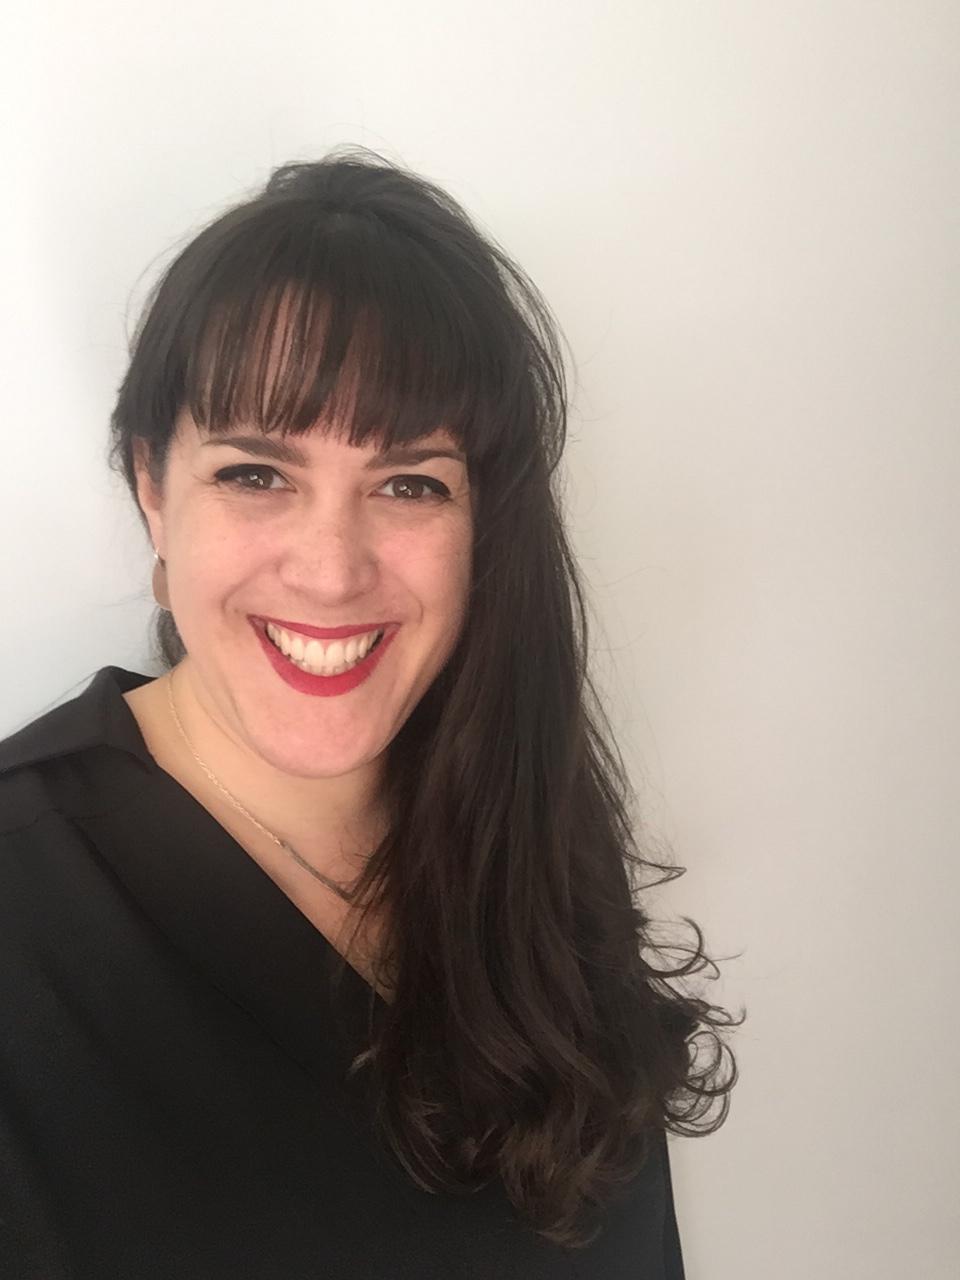 Sarah Stromquist